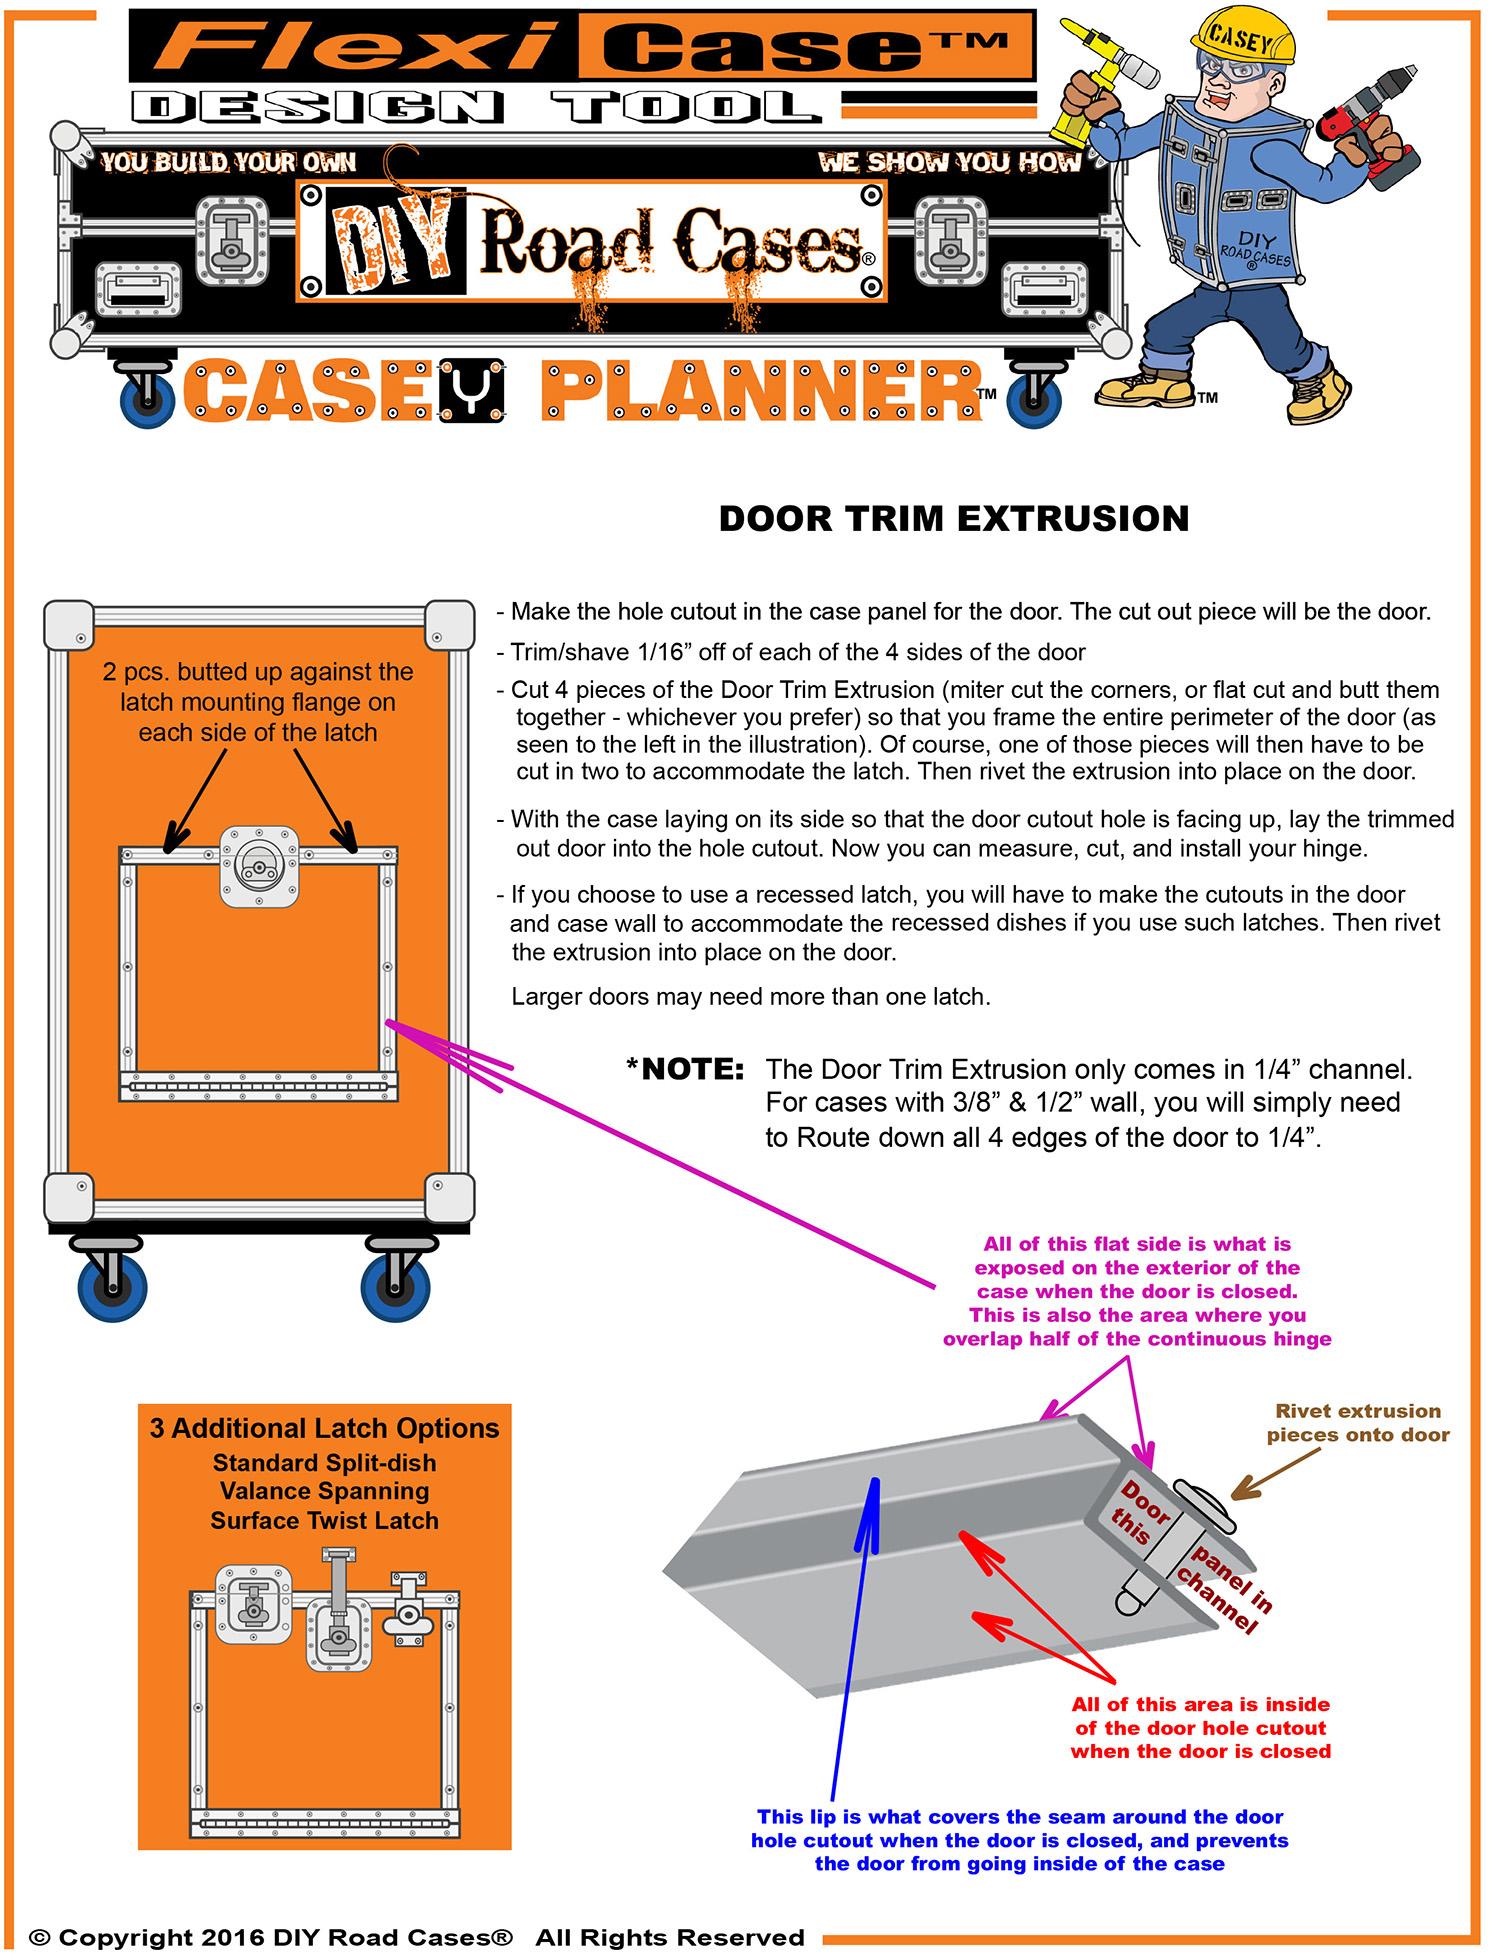 door-trim-extrusion-jpg-for-store-updated-newest.jpg